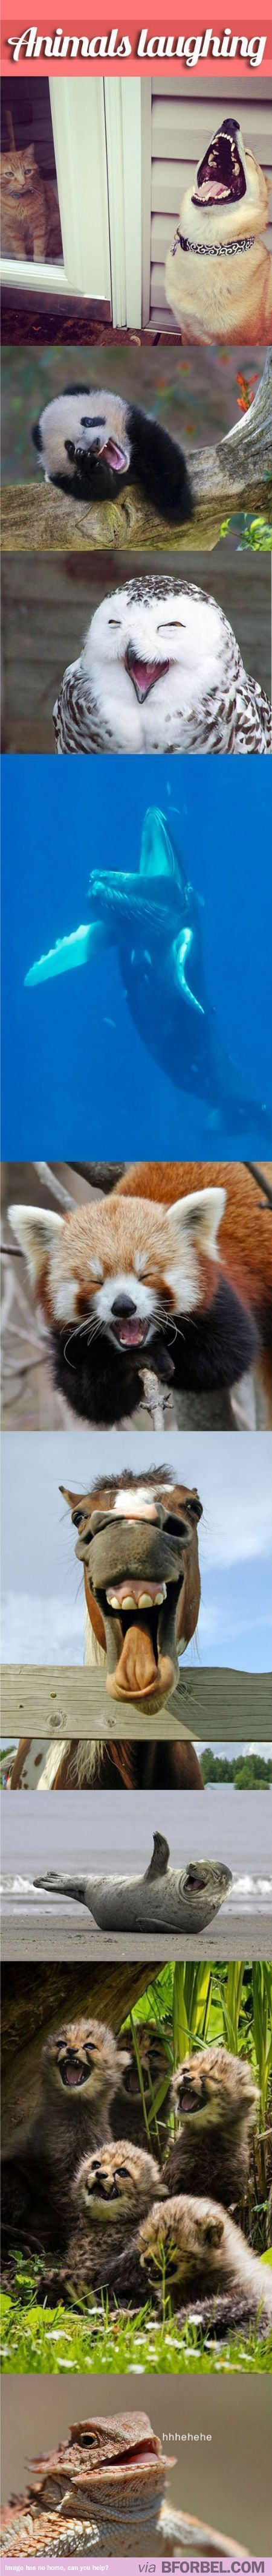 Animals laughing. so stinkin cute!